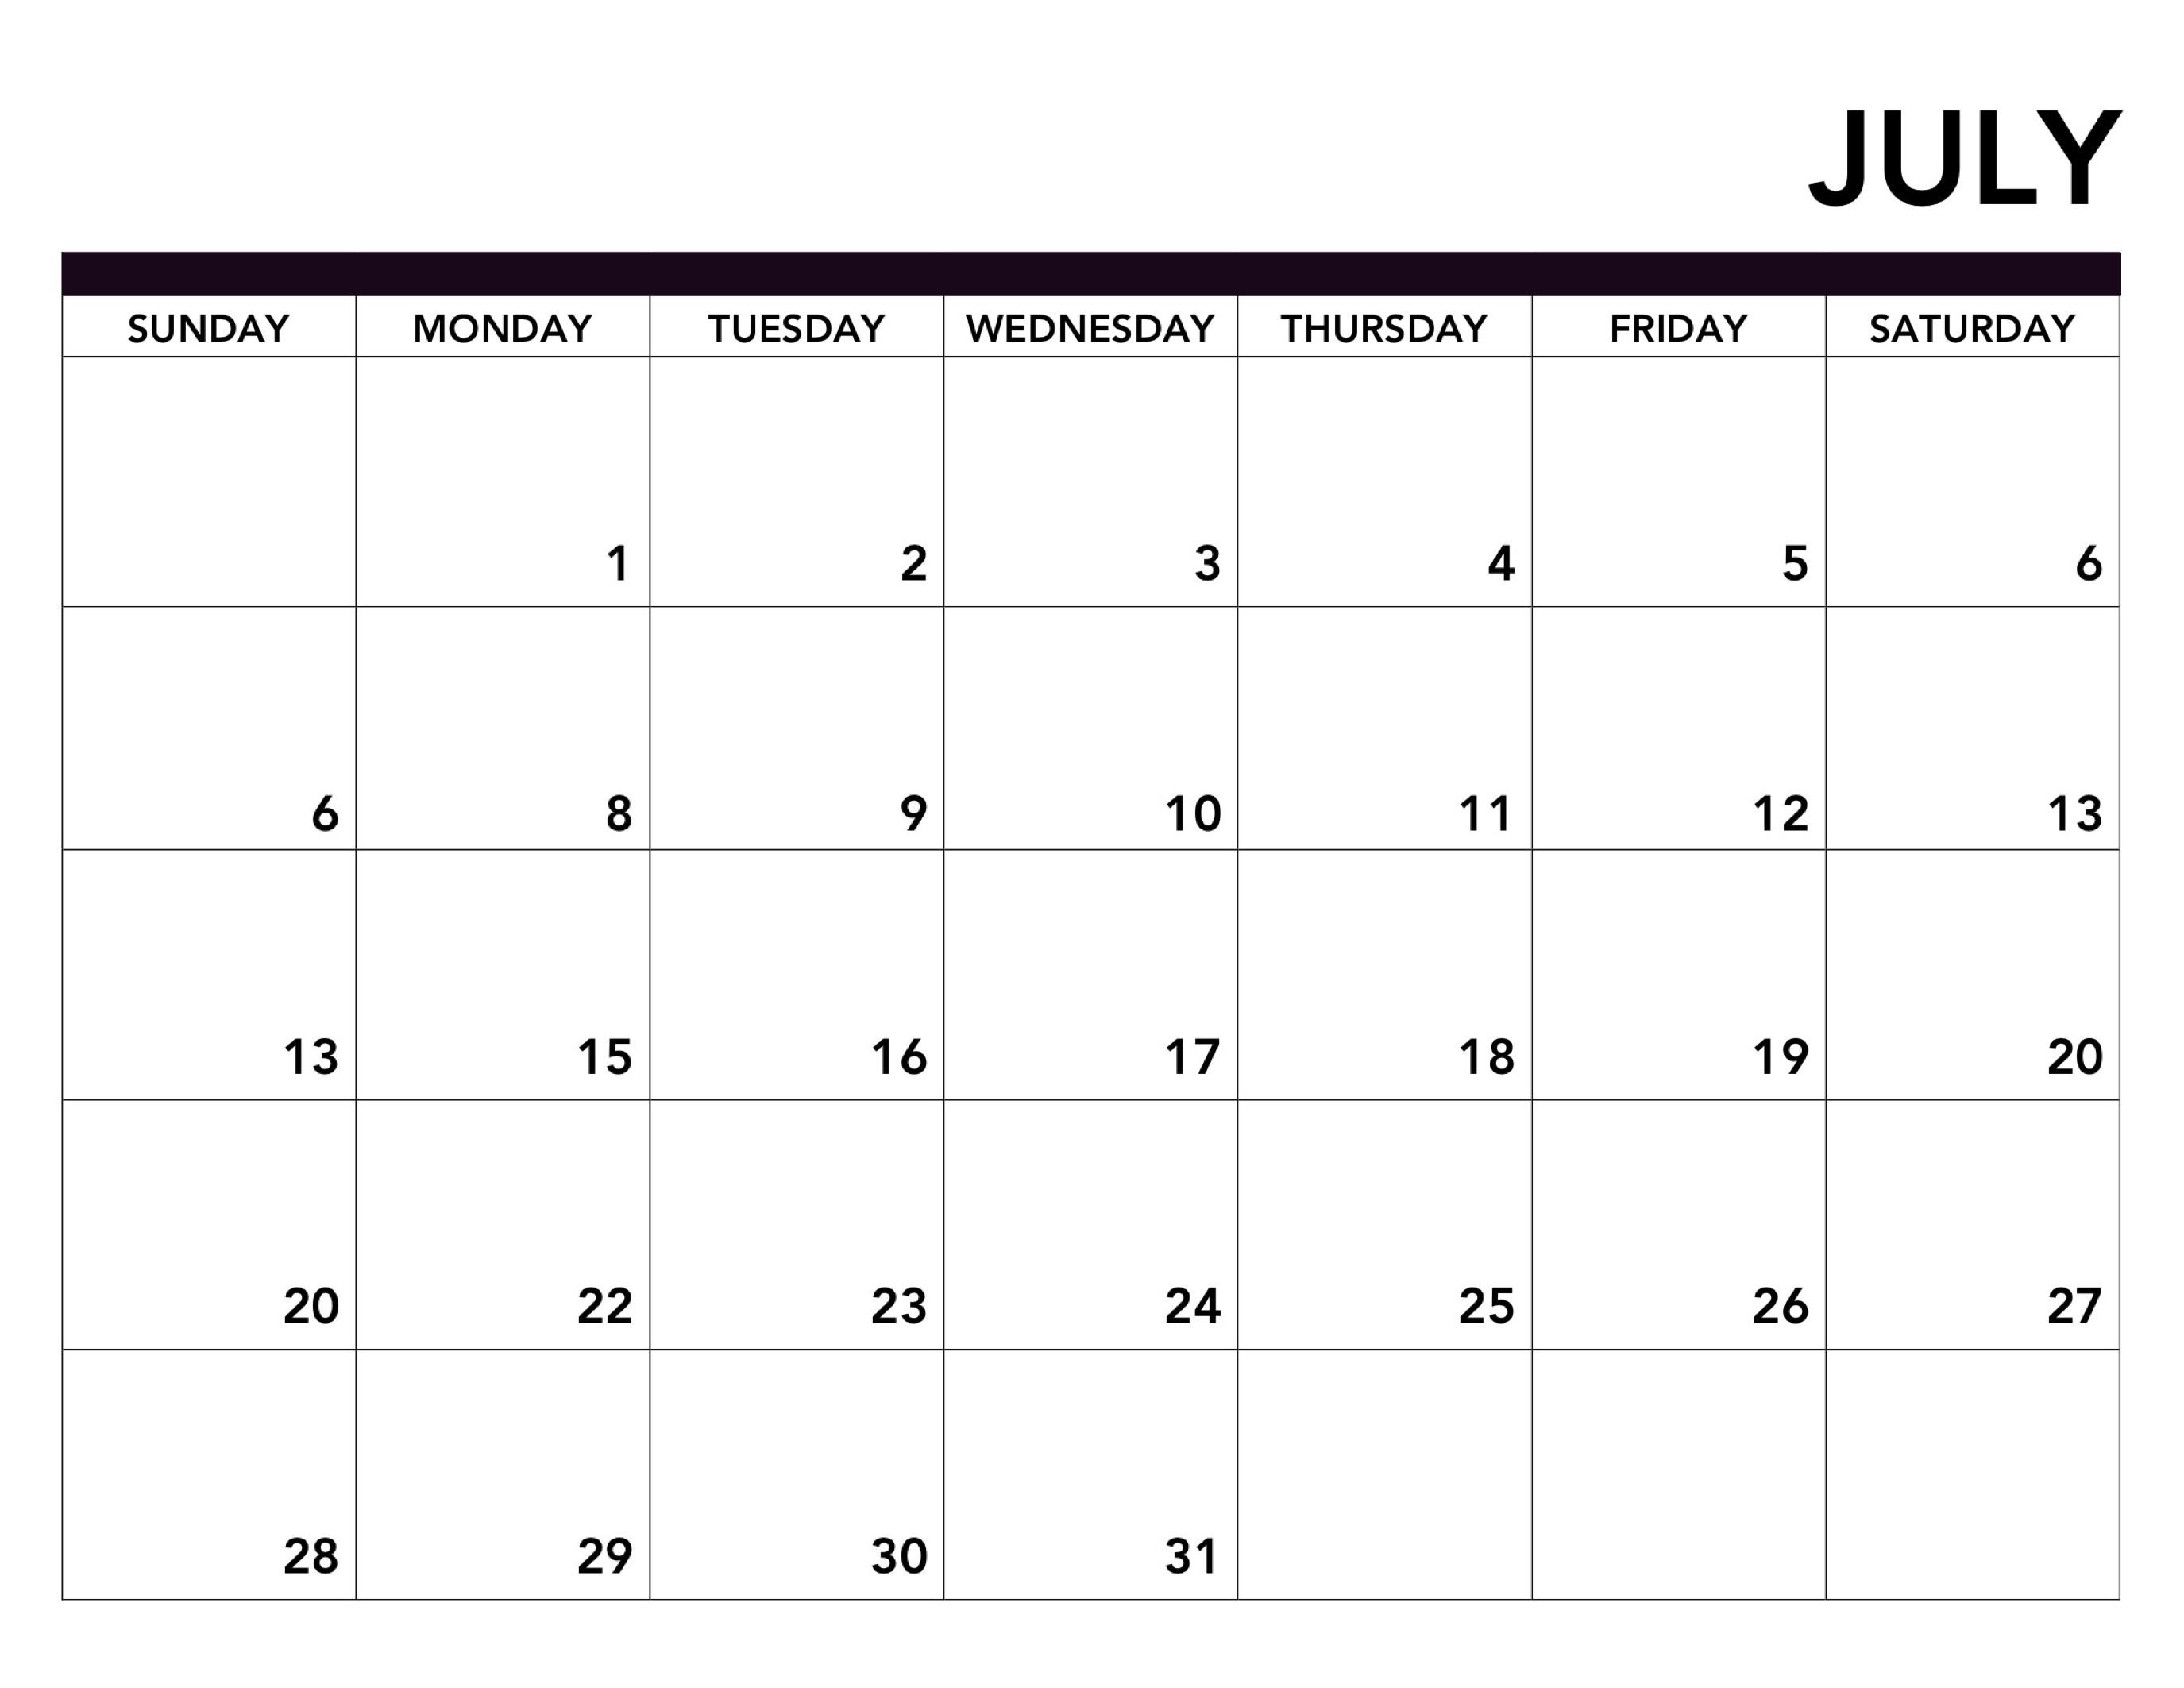 Monthly Blank Calendar July 2019 Printable Template-June July & August Blank Calendar